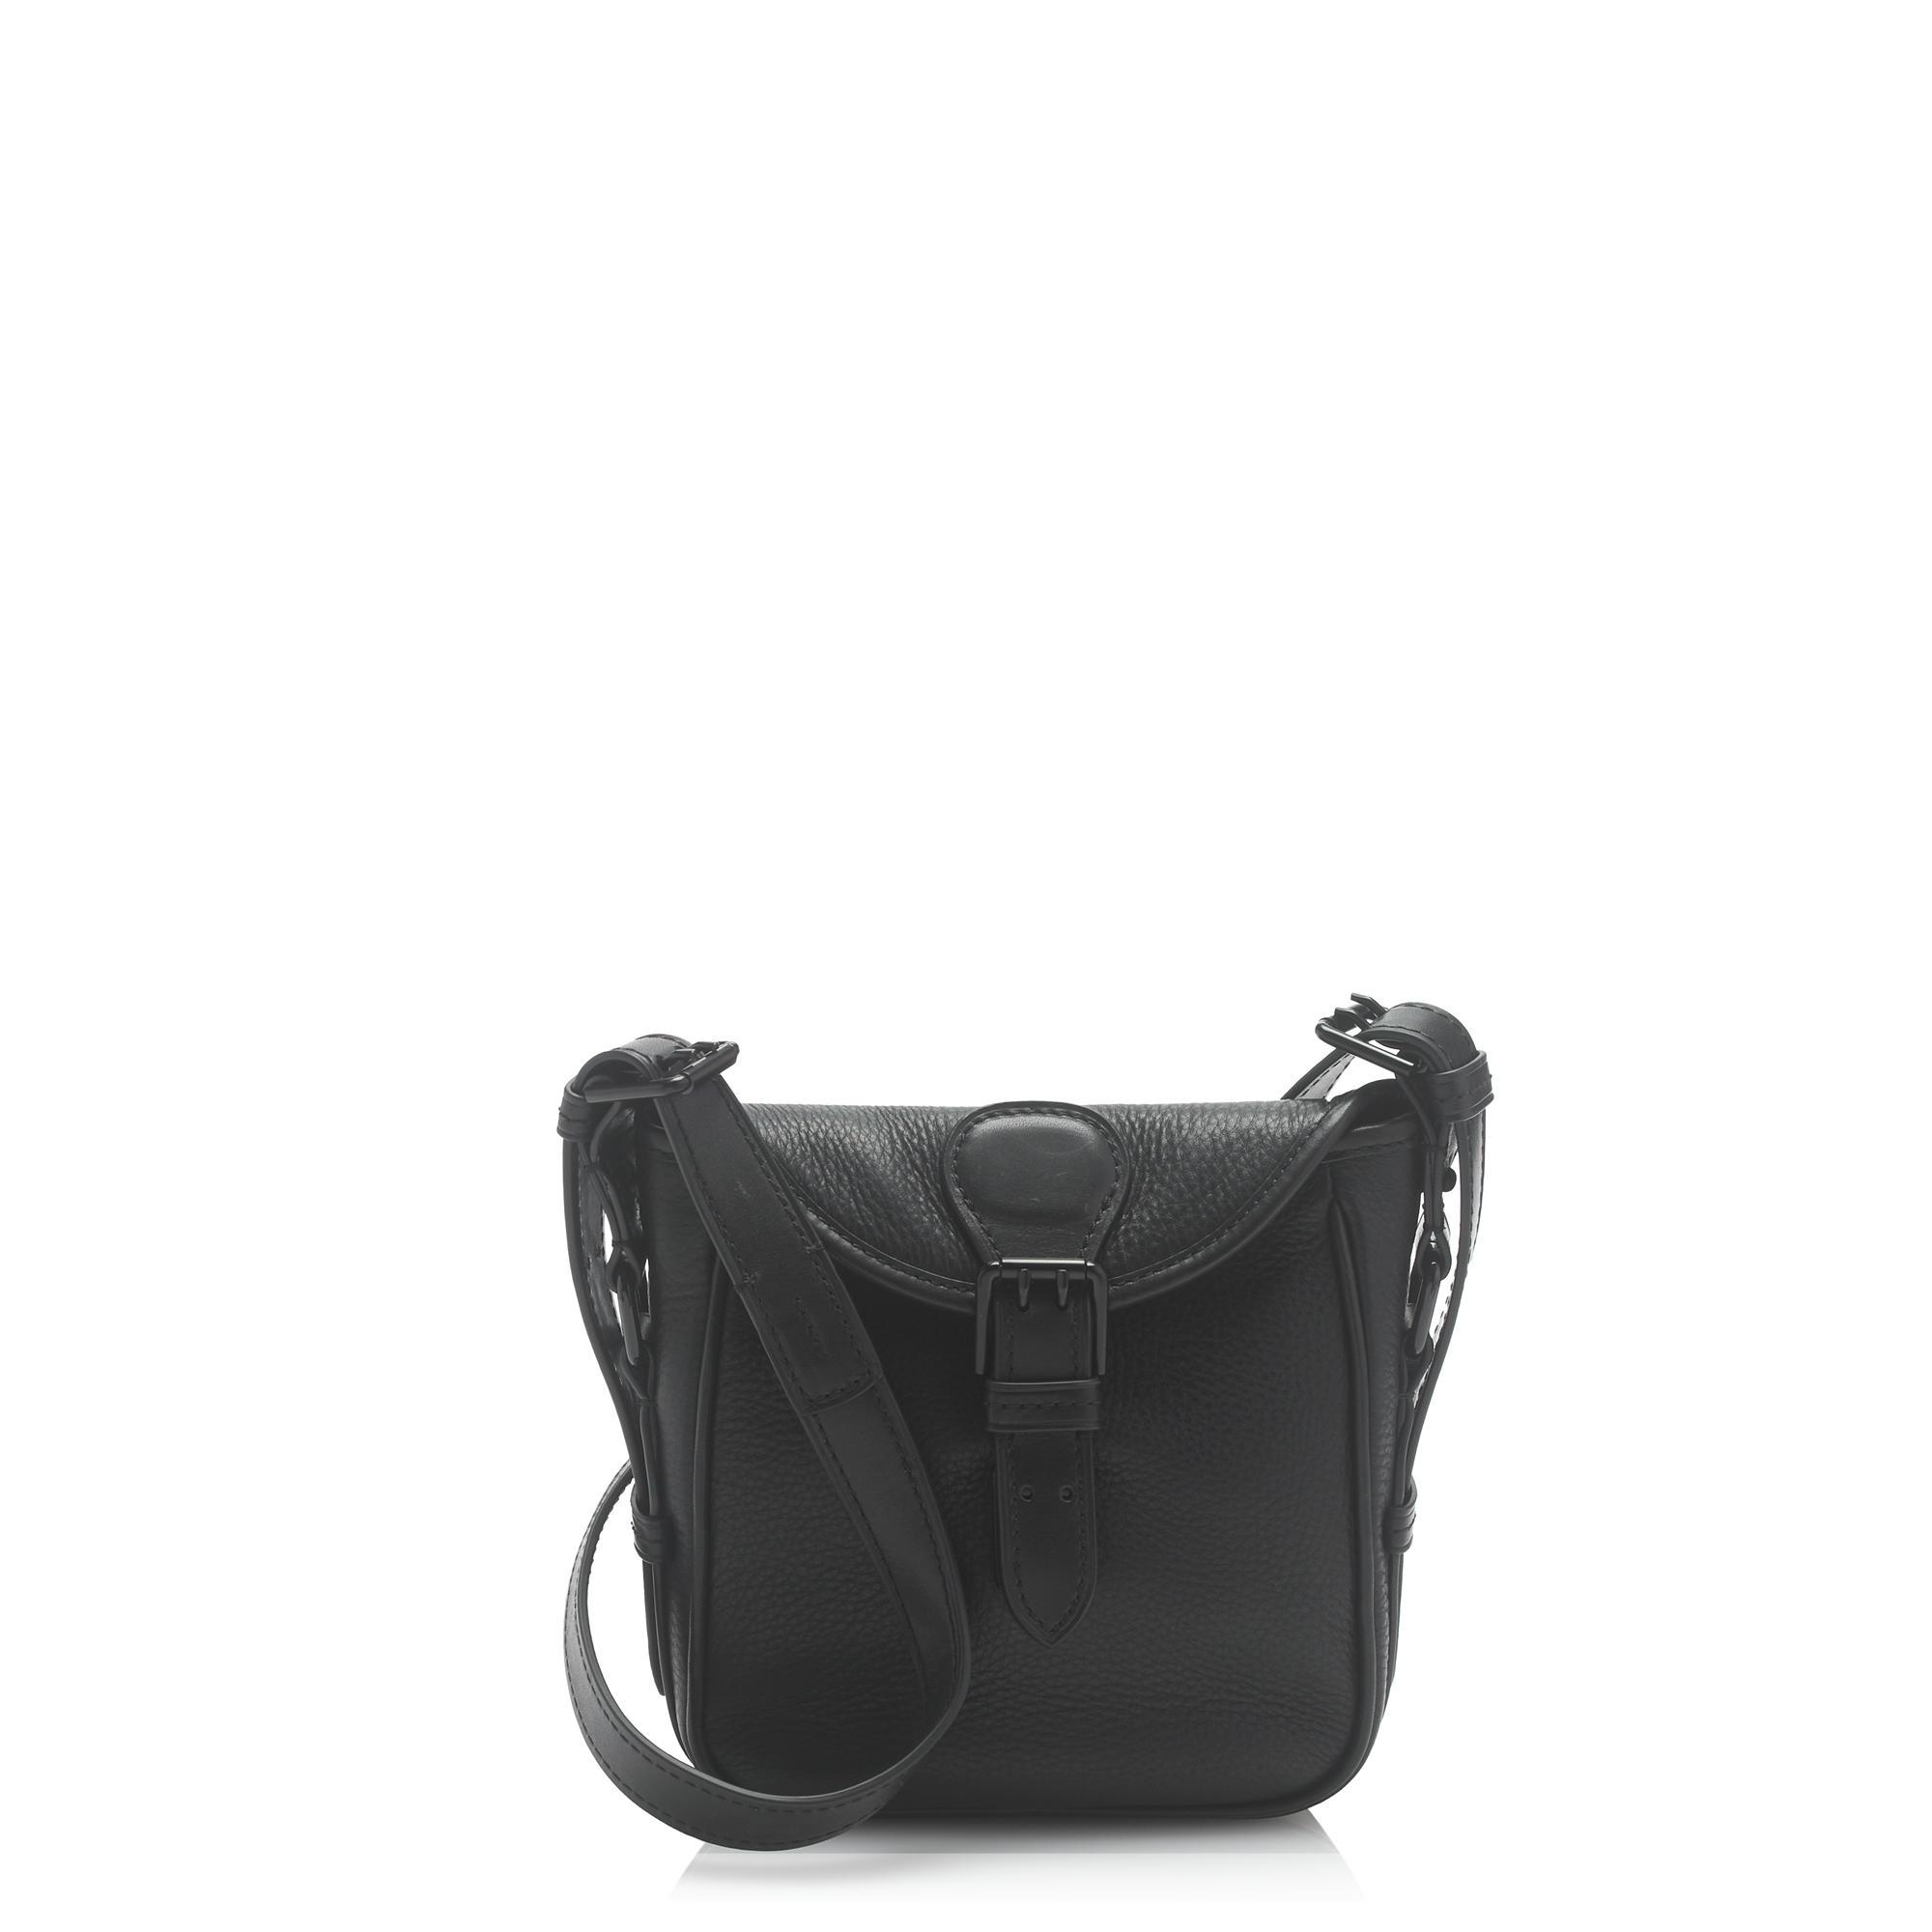 J.Crew Canyon Crossbody Bag in Black